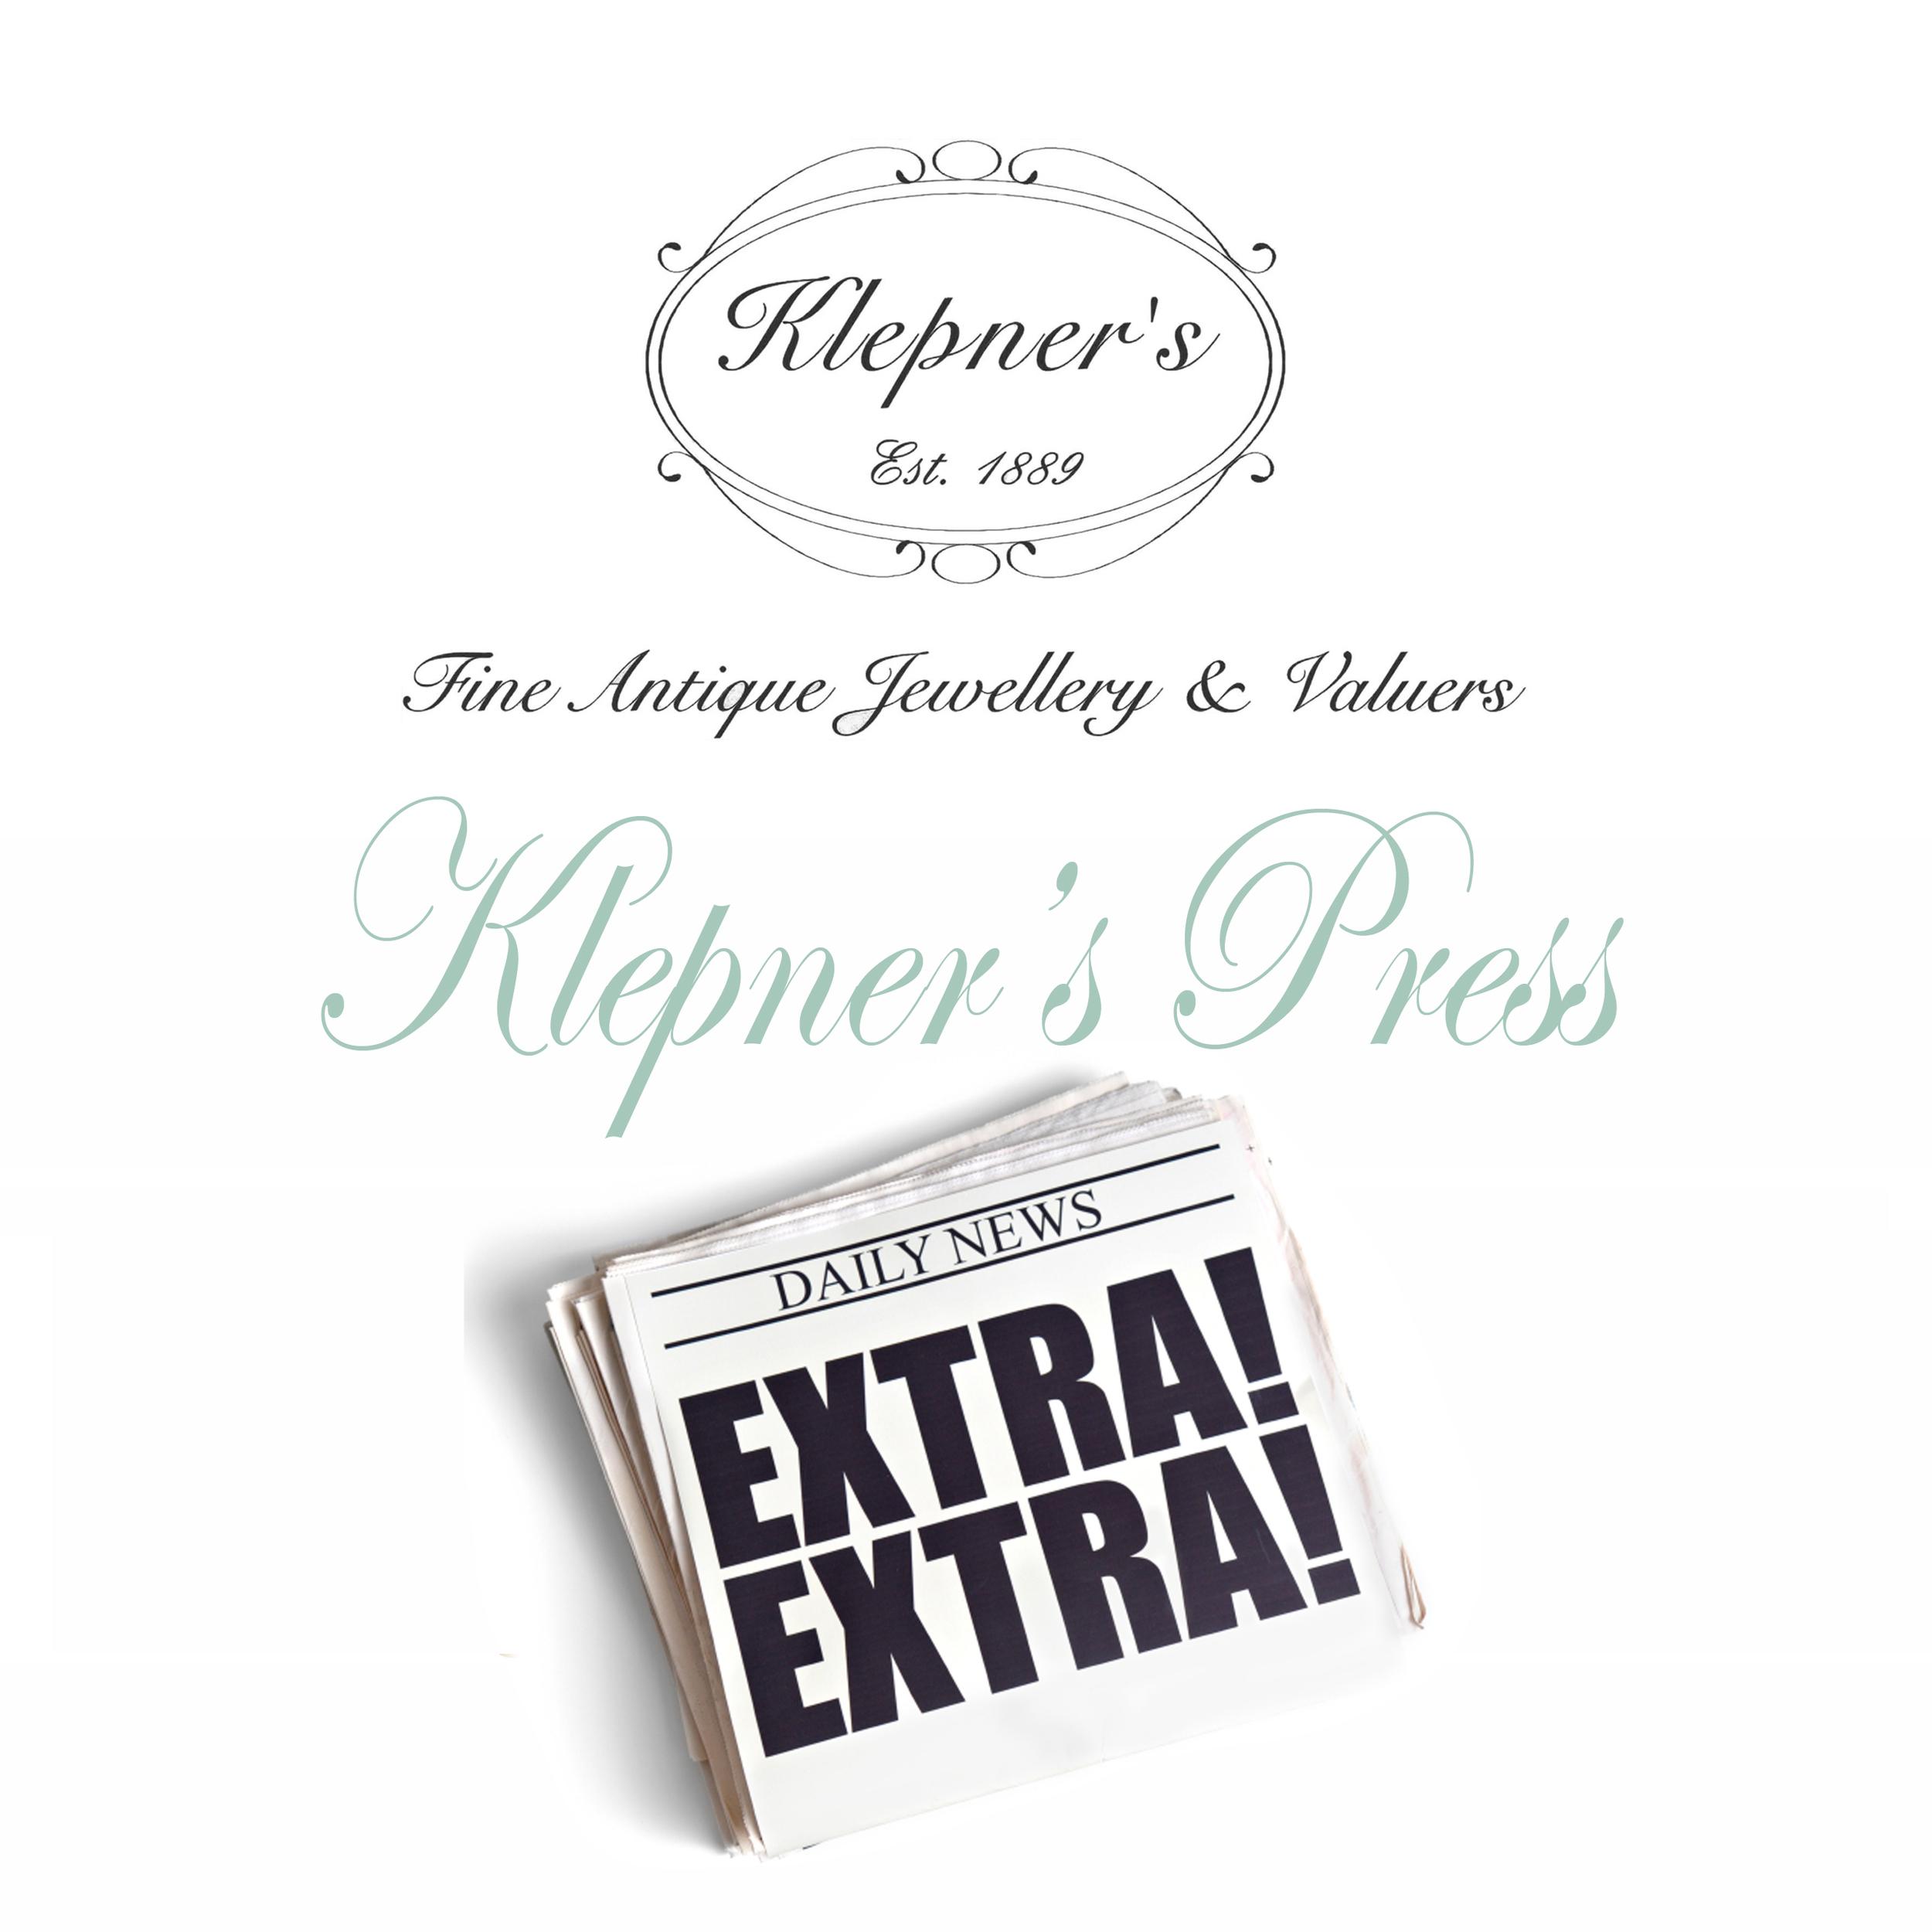 Klepners News & Press.JPG